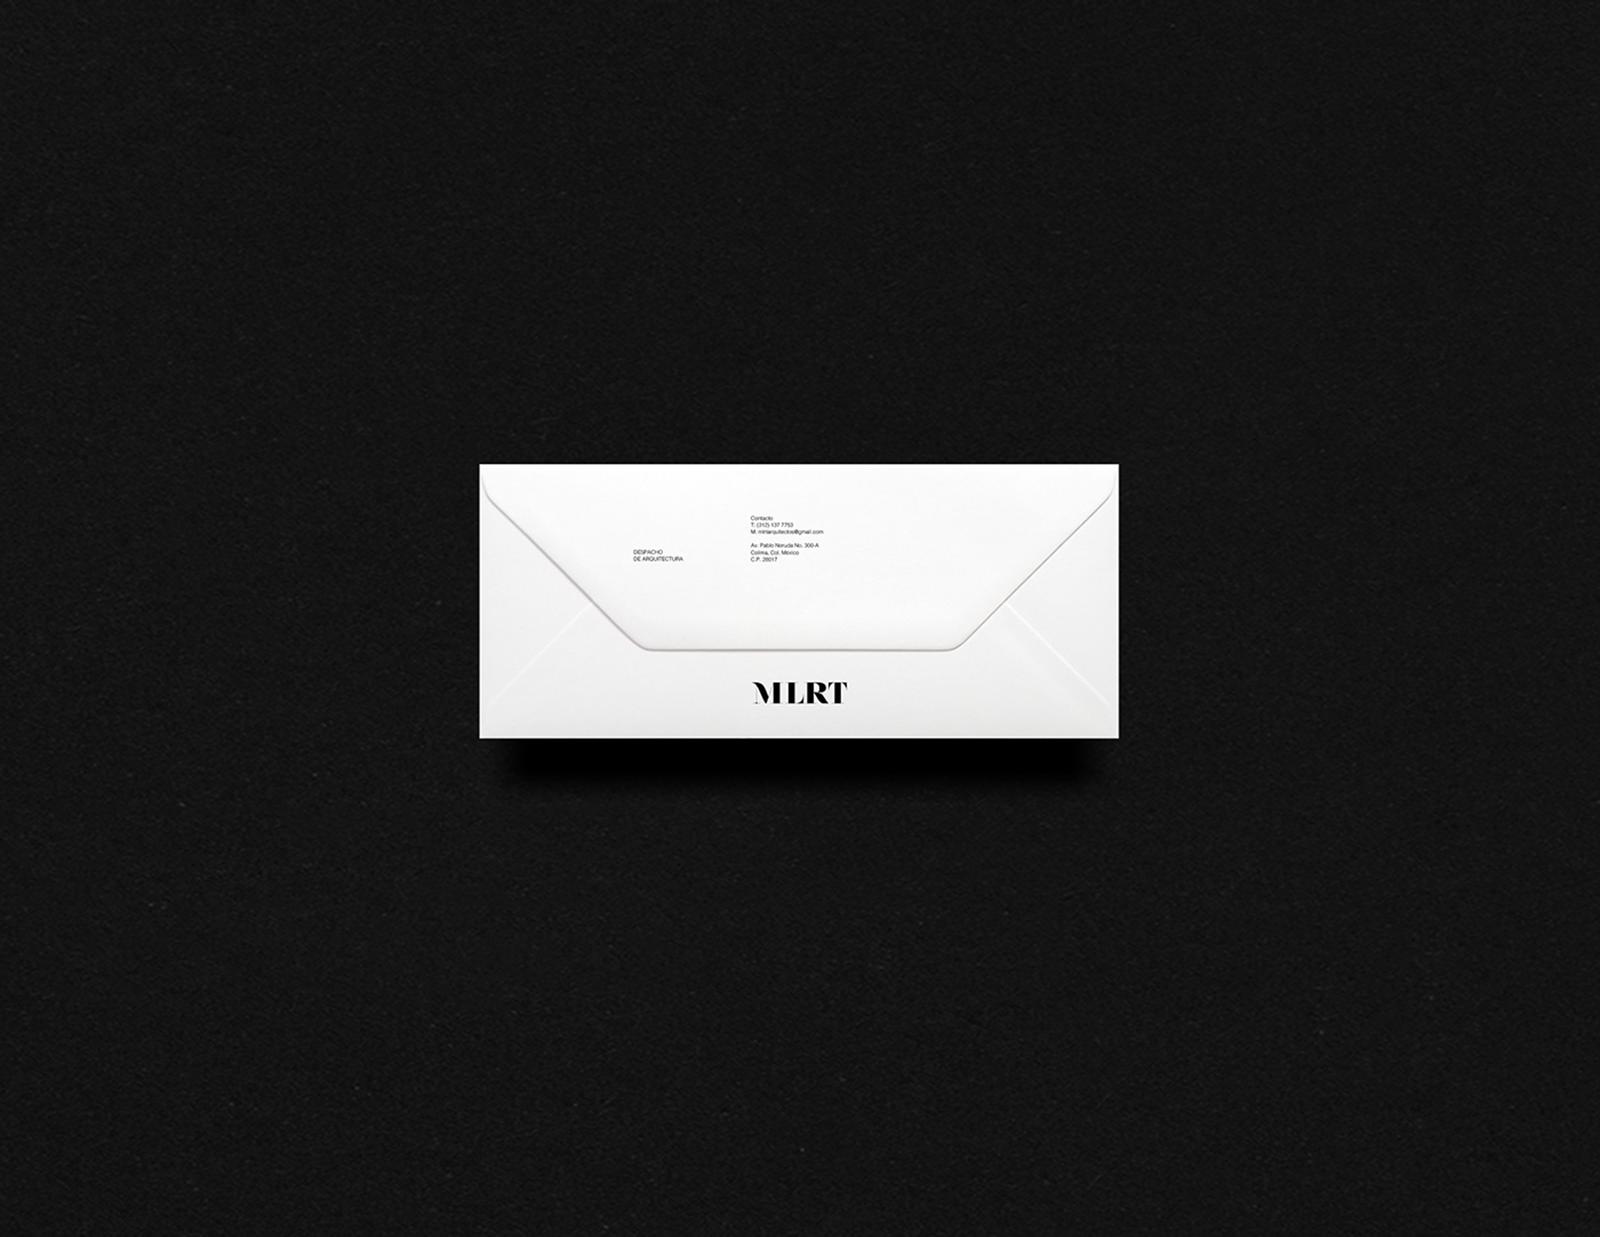 MLRT 企業品牌視覺VI形象設計欣賞-VI設計3